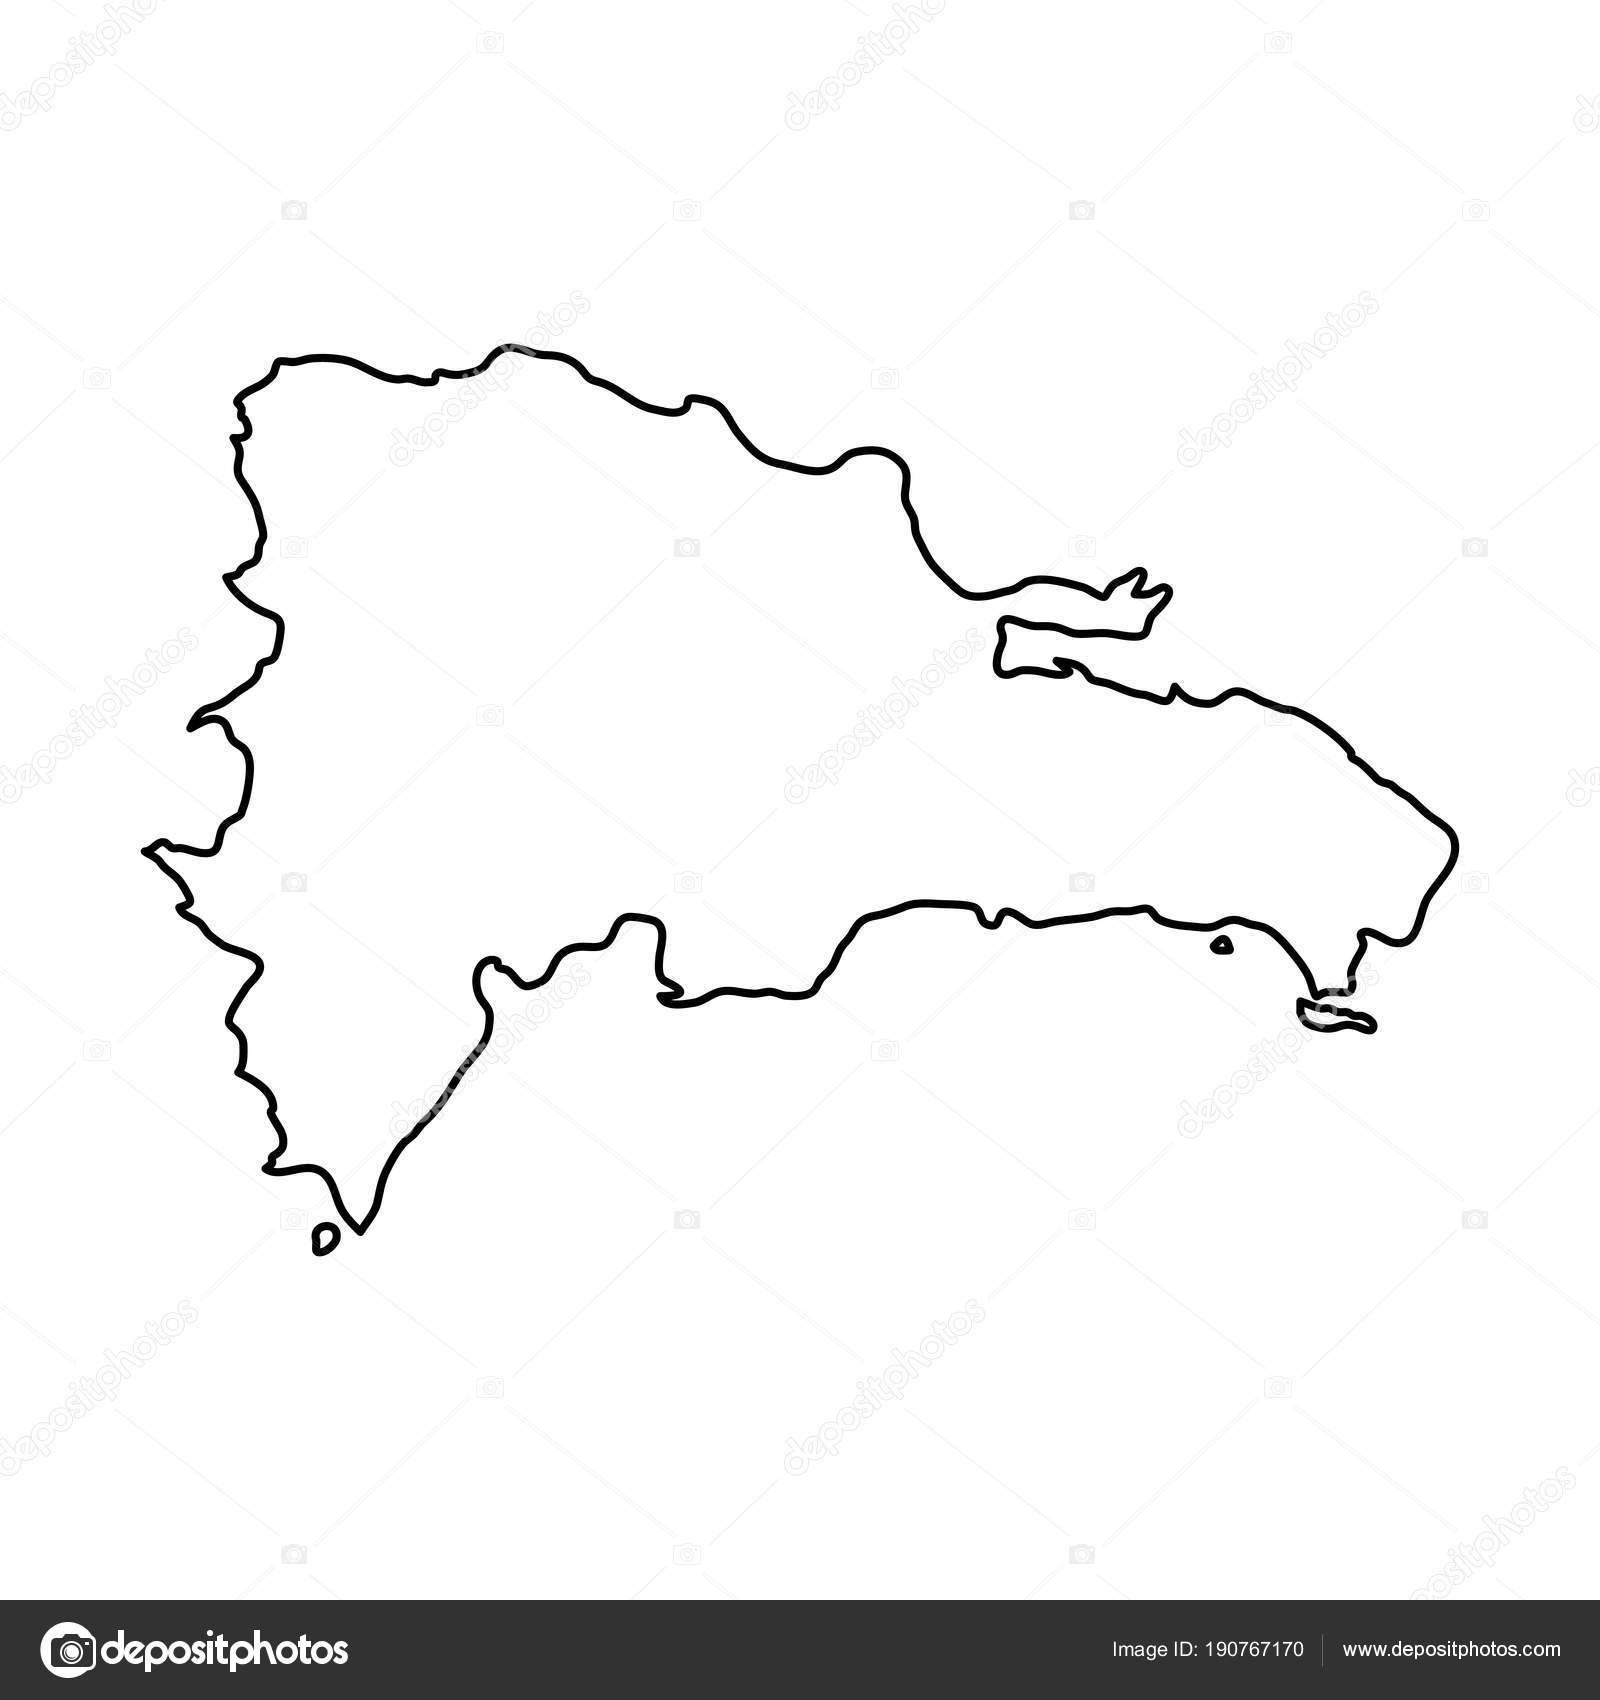 Mapa De Republica Dominicana En Blanco.Republica Dominicana Mapa De Curvas De Nivel Negro De